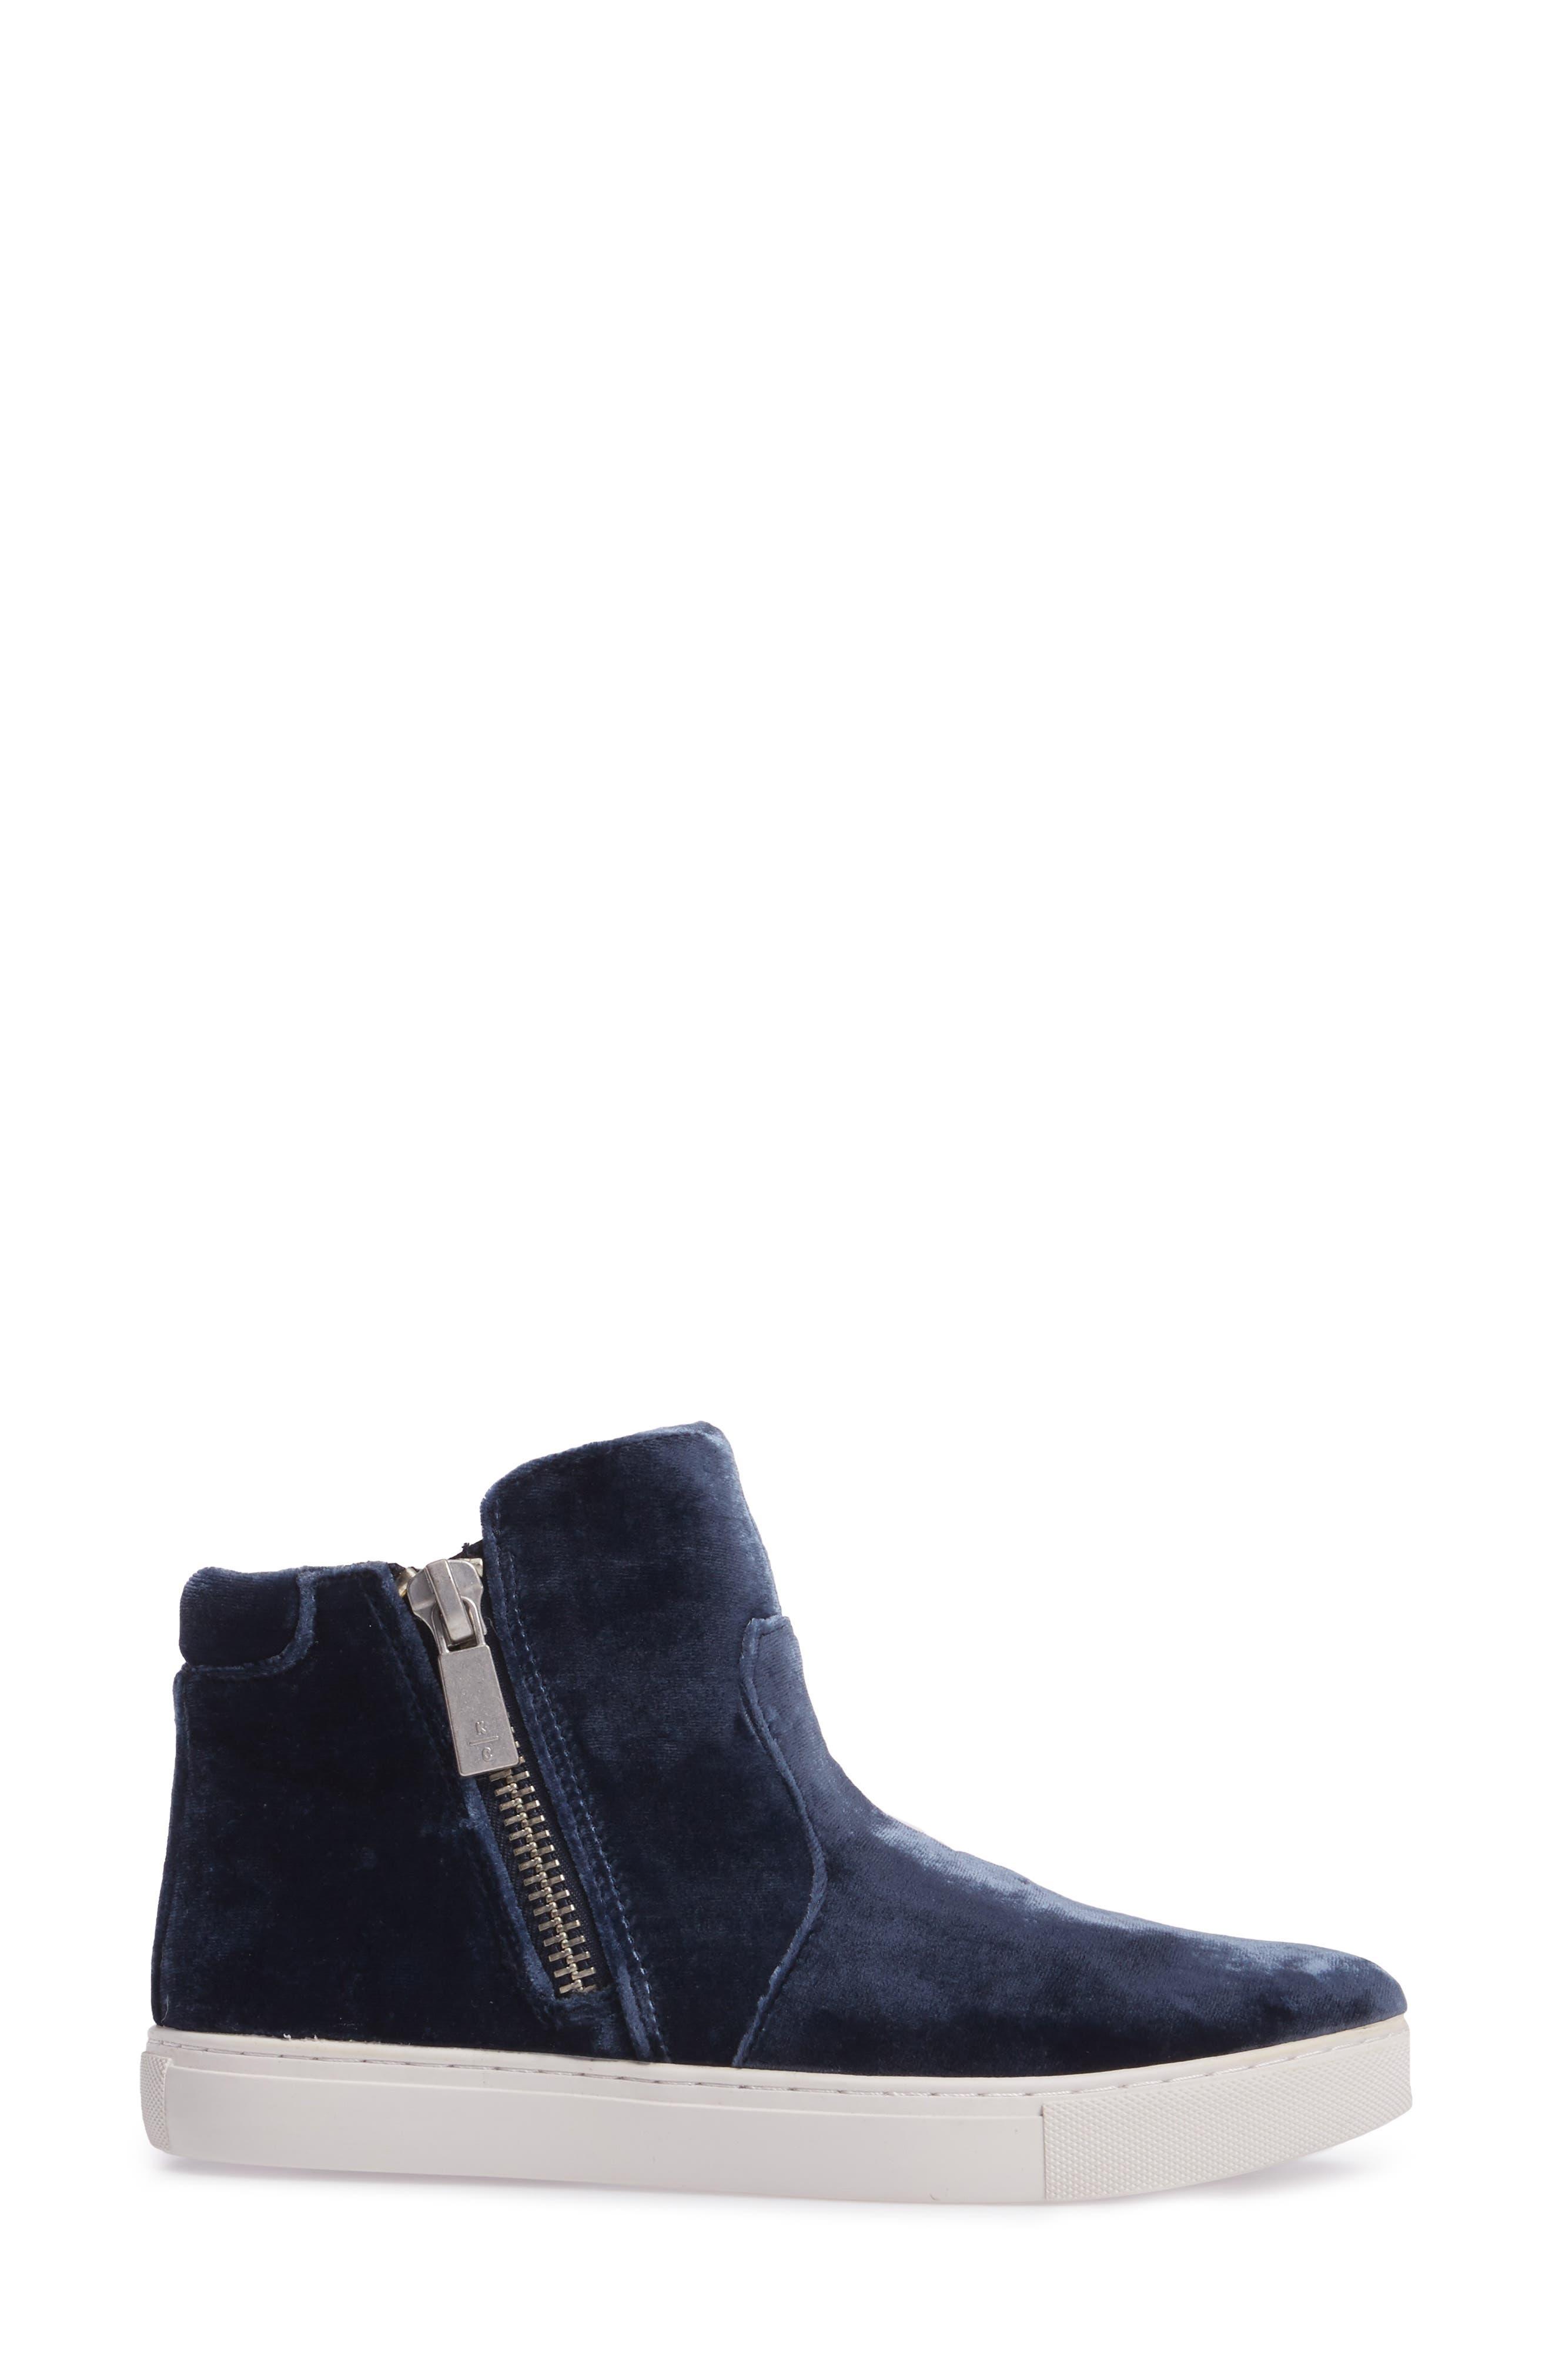 Alternate Image 3  - Kenneth Cole New York 'Kiera' Zip High Top Sneaker (Women)